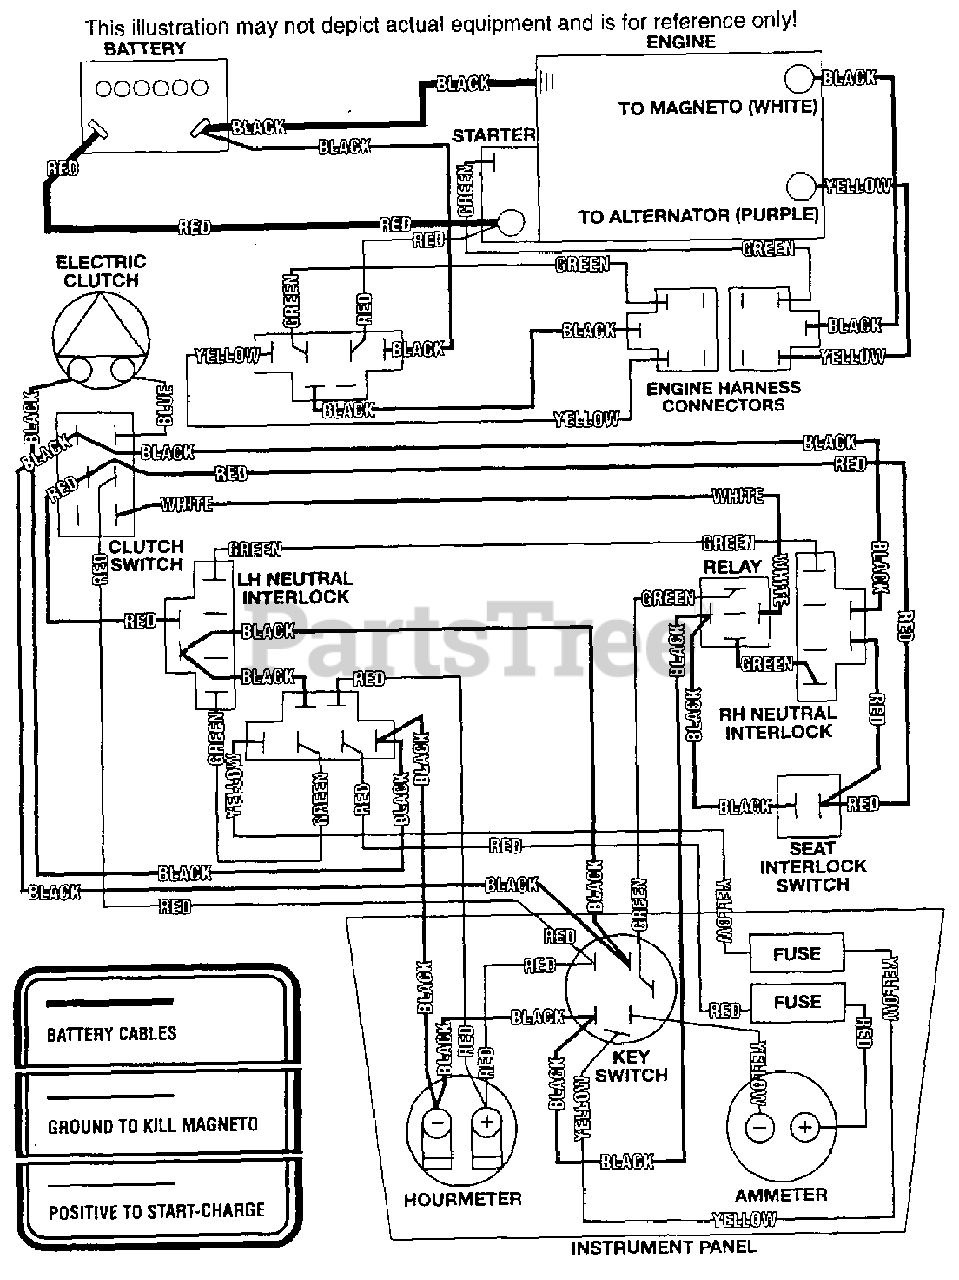 Kohler Engine Wiring Diagram from www.partstree.com